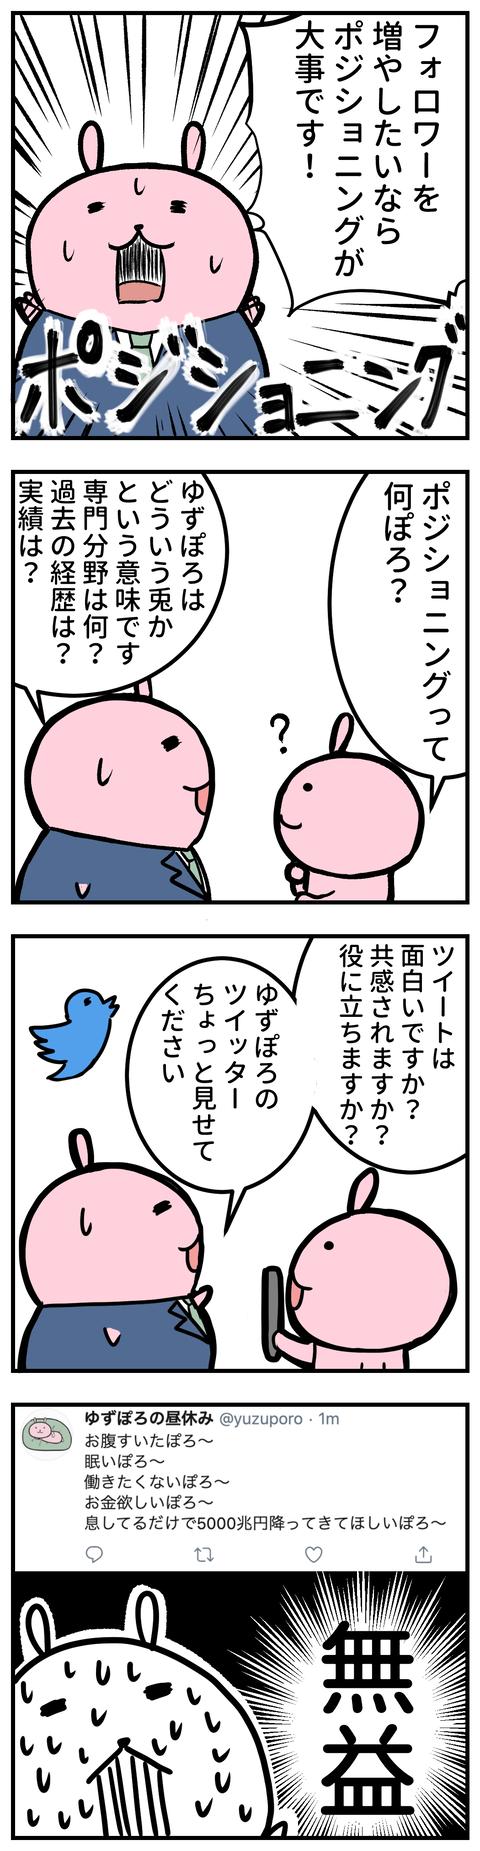 manga-yuzuporo33-1